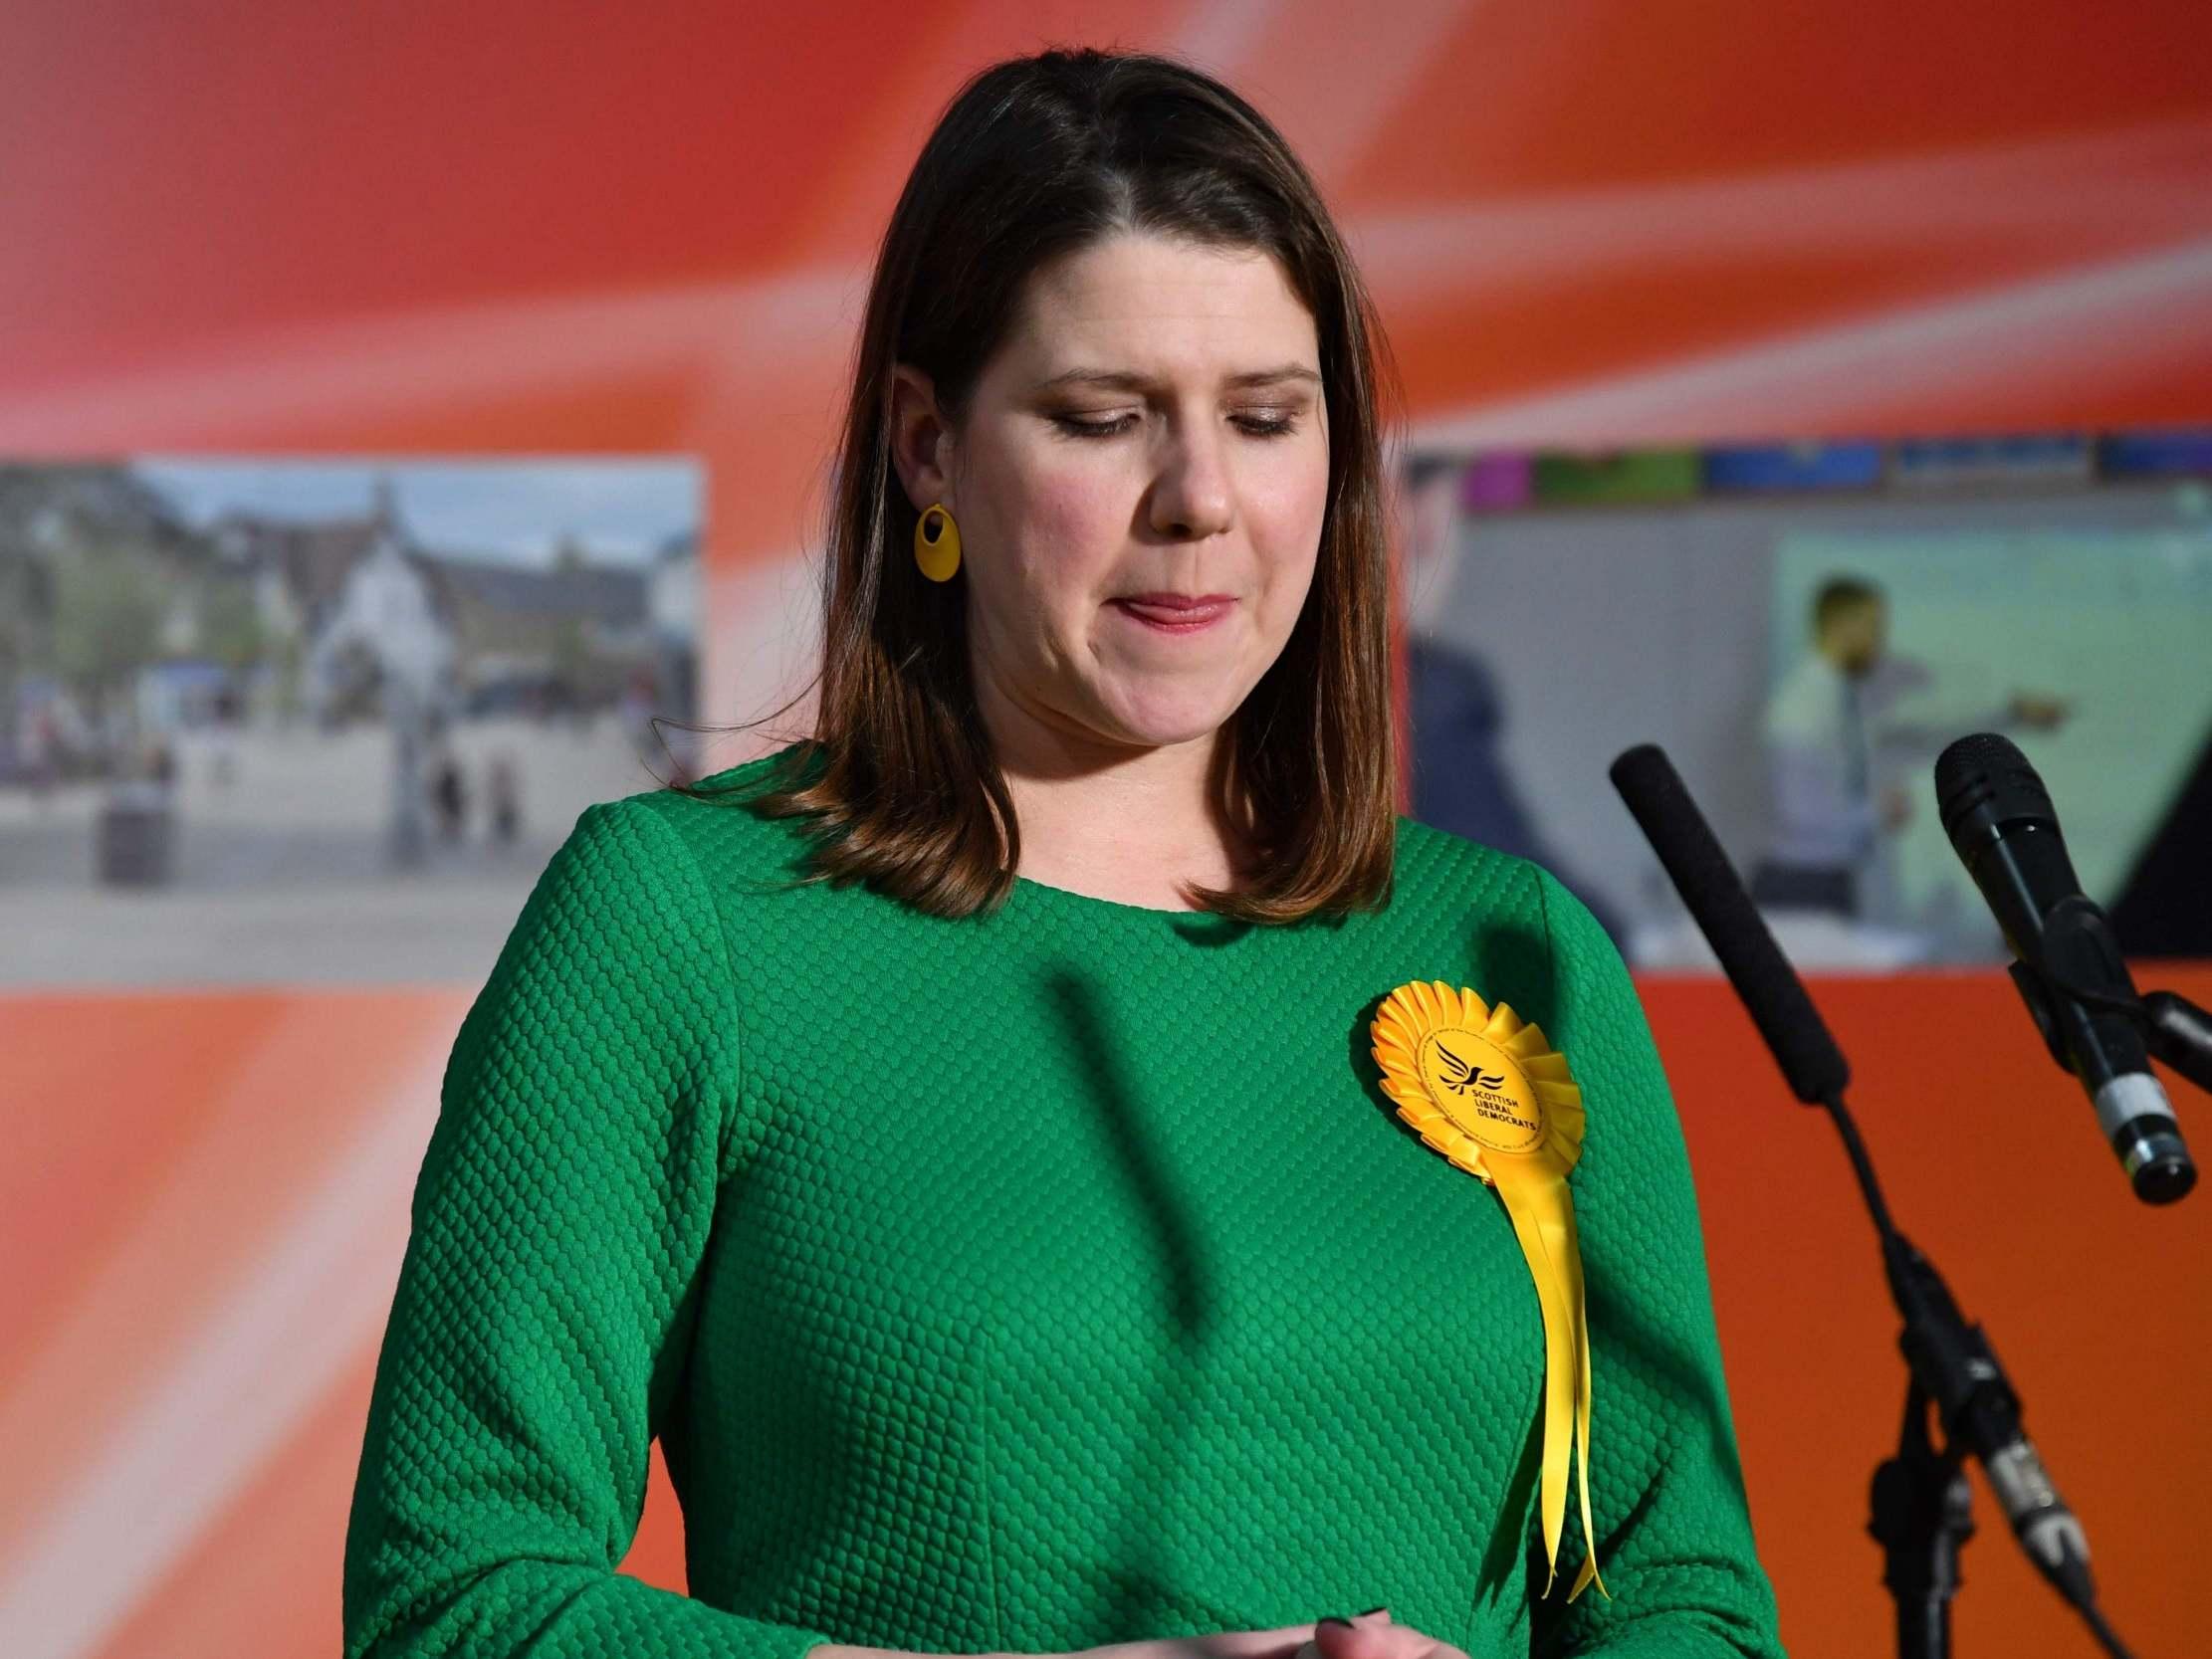 Lib Dem leader Jo Swinson loses her seat